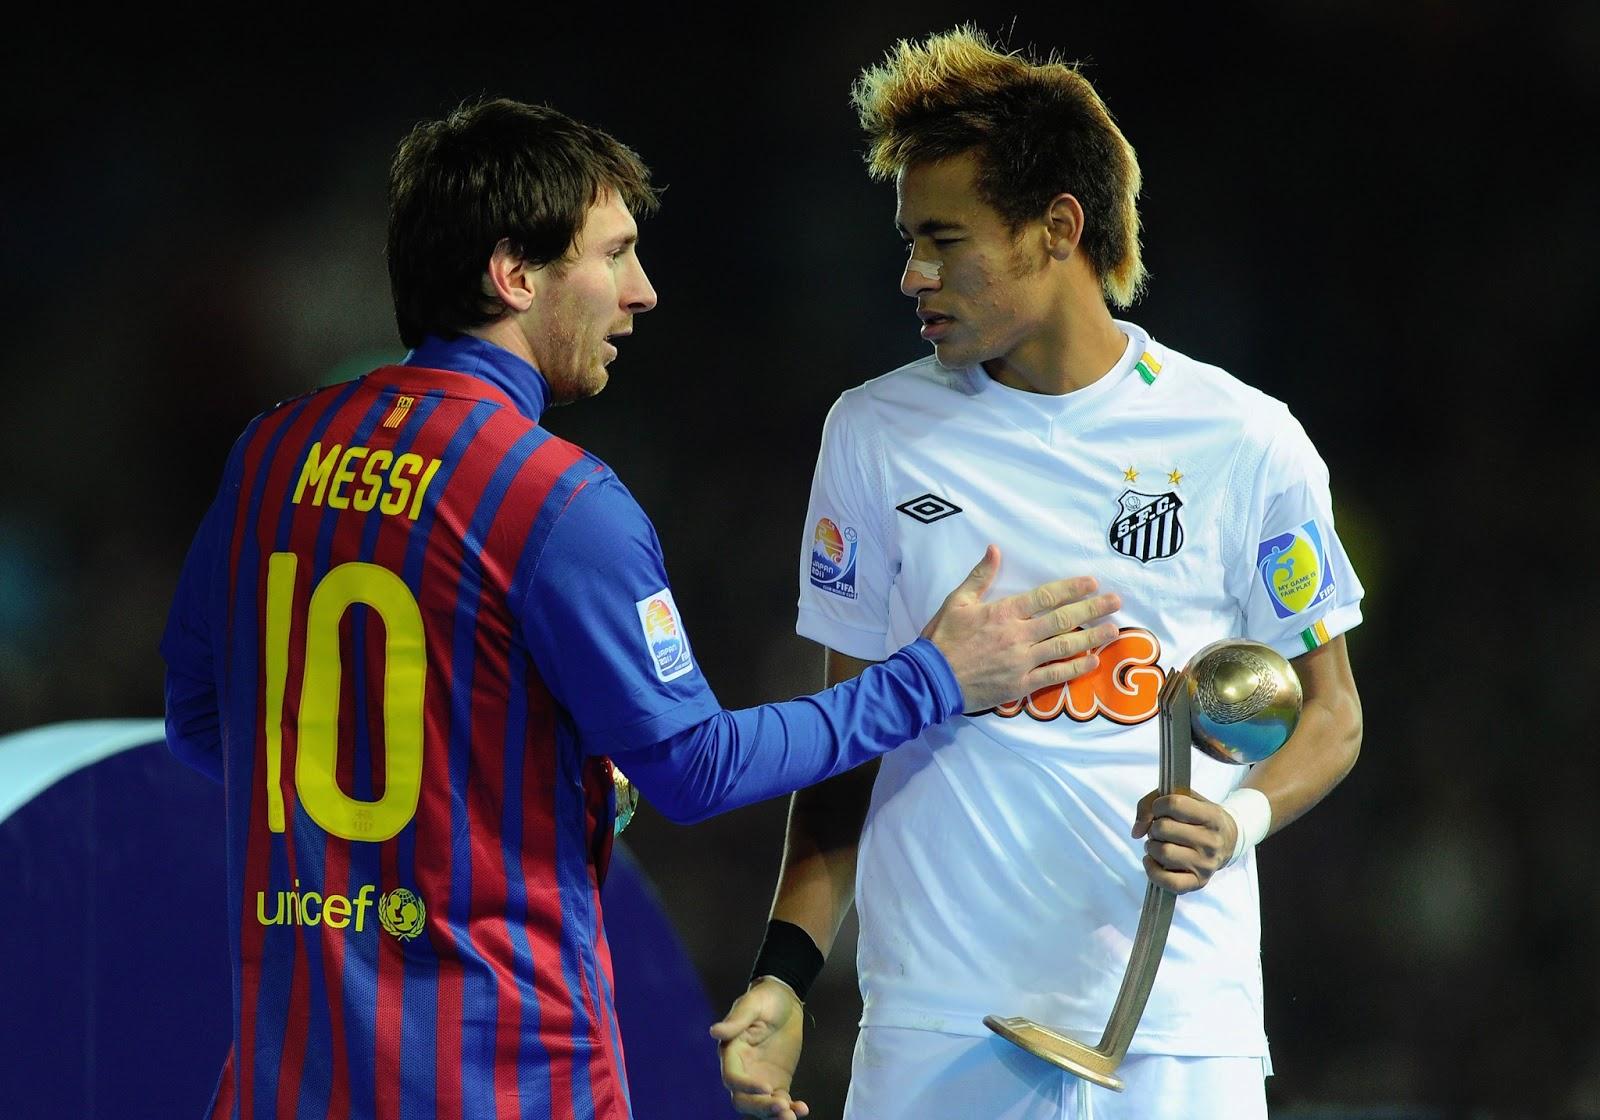 49 Messi And Neymar Barcelona Wallpaper On Wallpapersafari